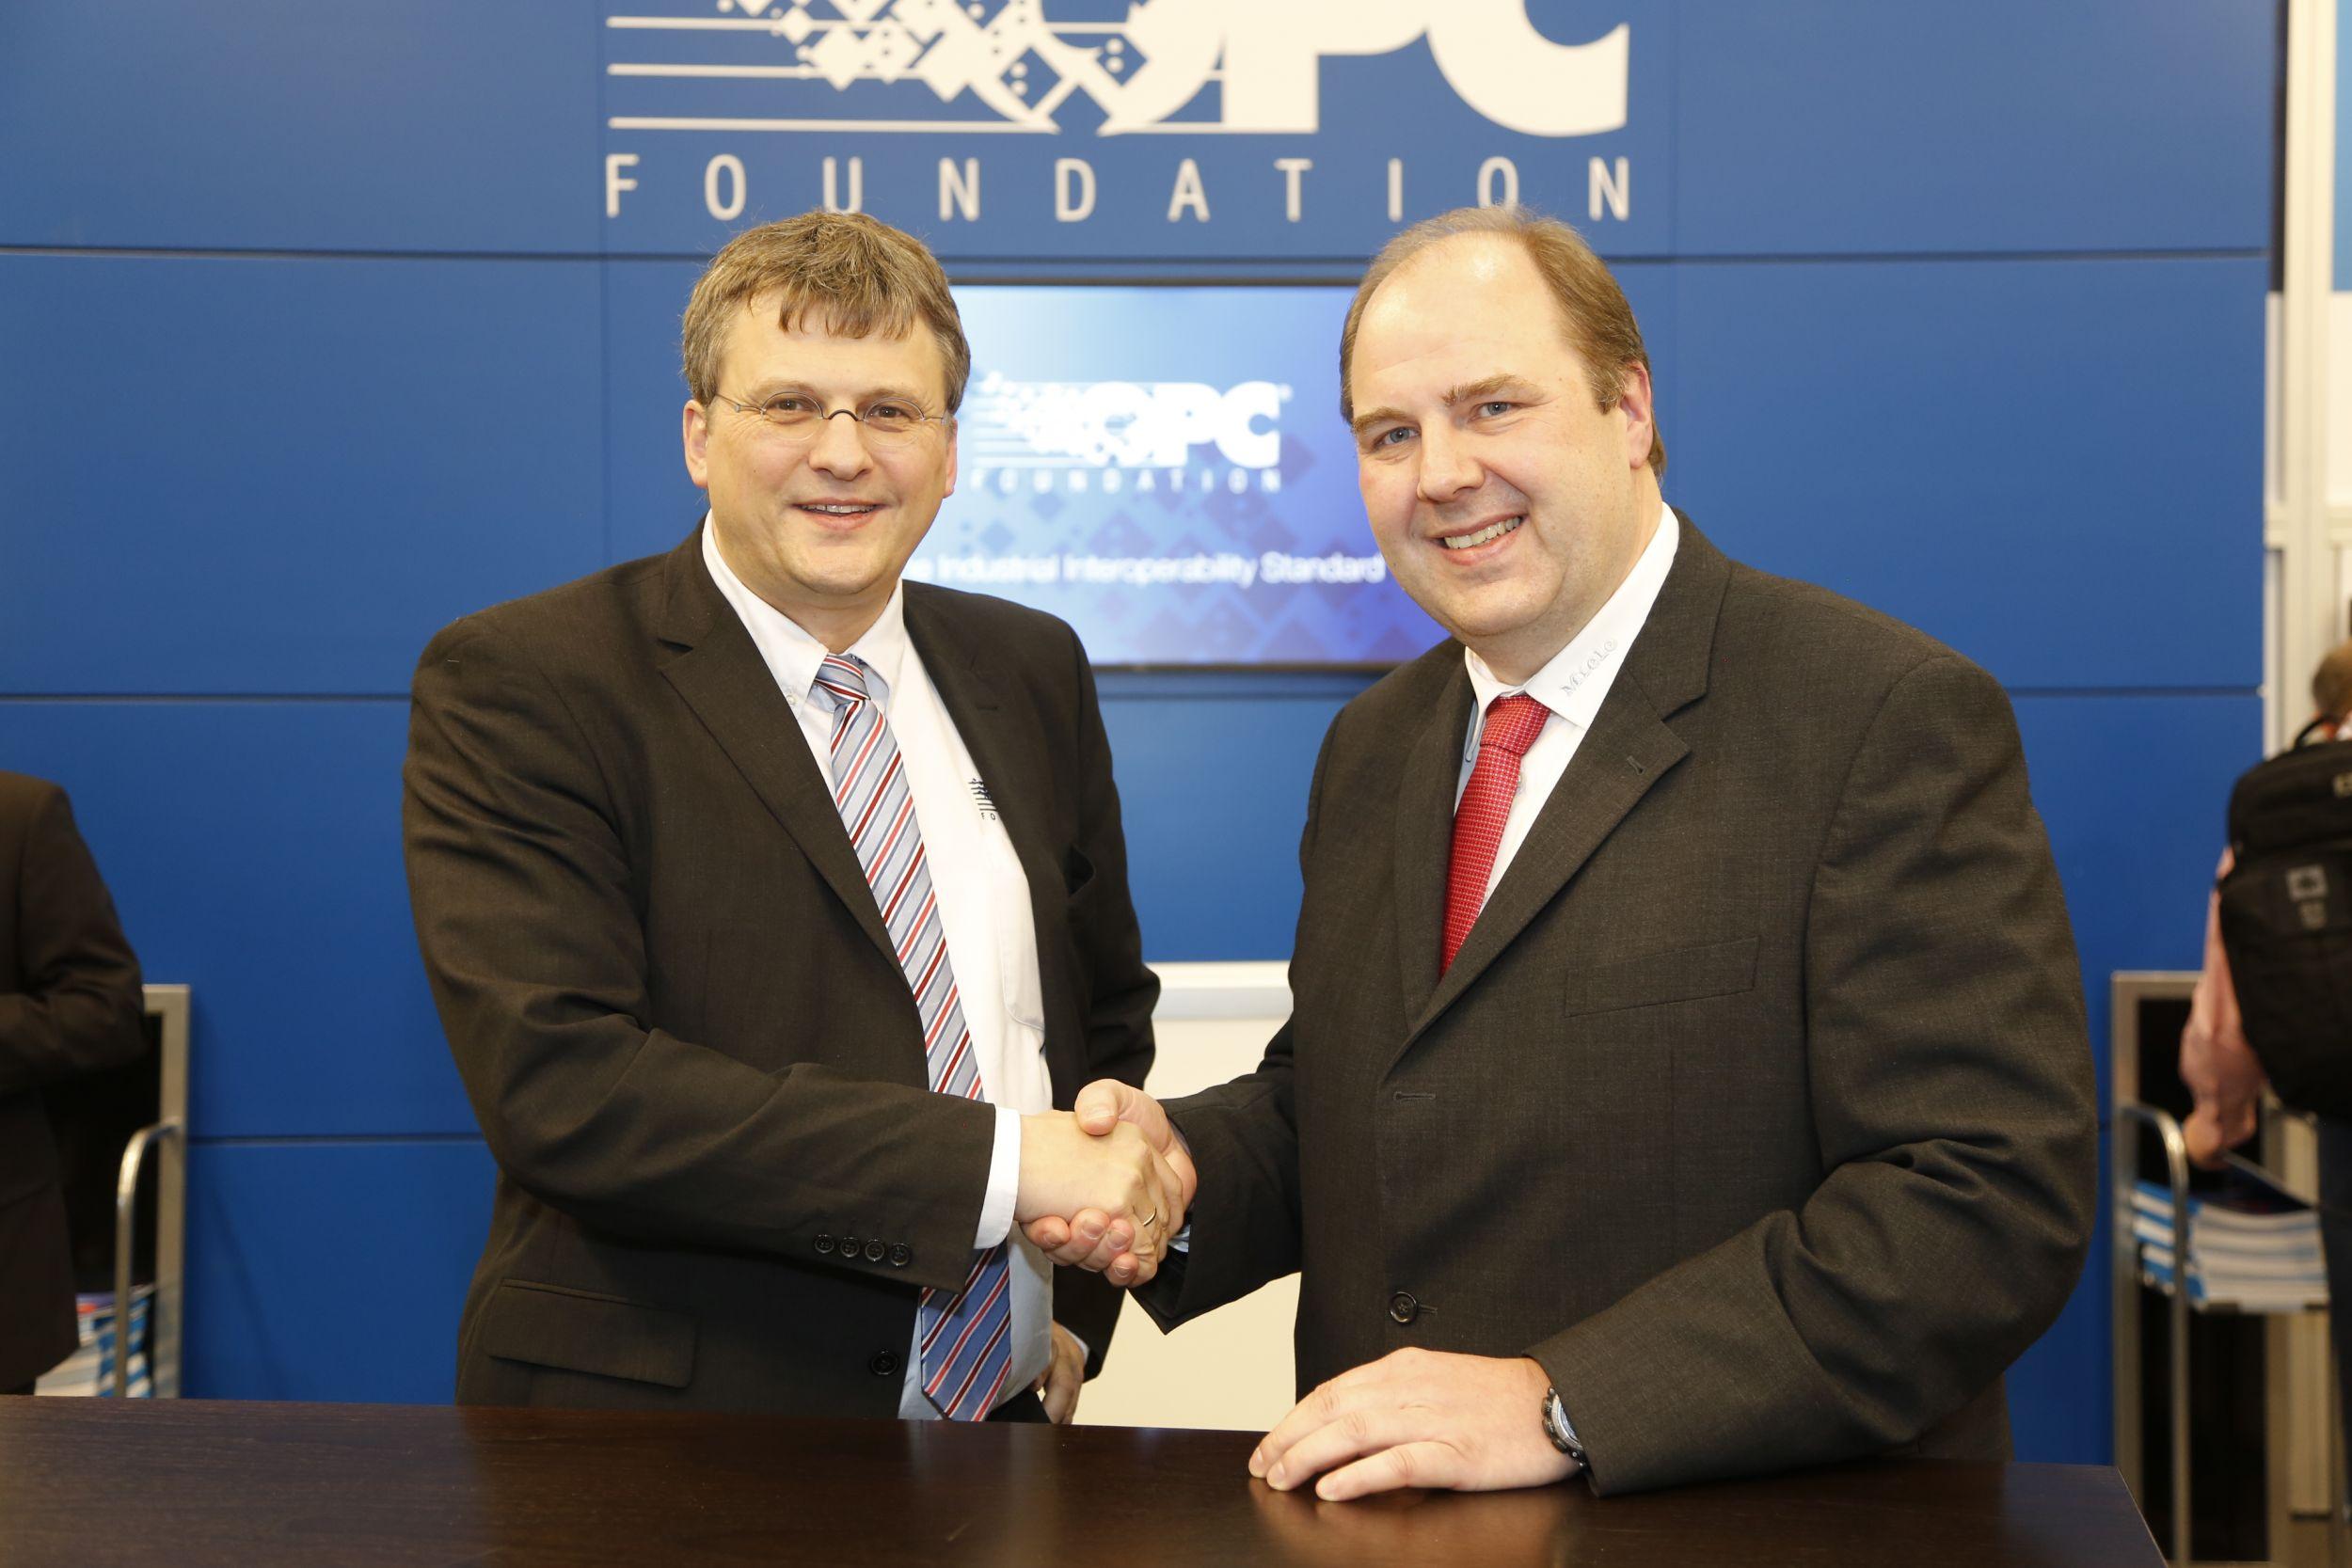 Miele: Neues Mitglied der OPC Foundation